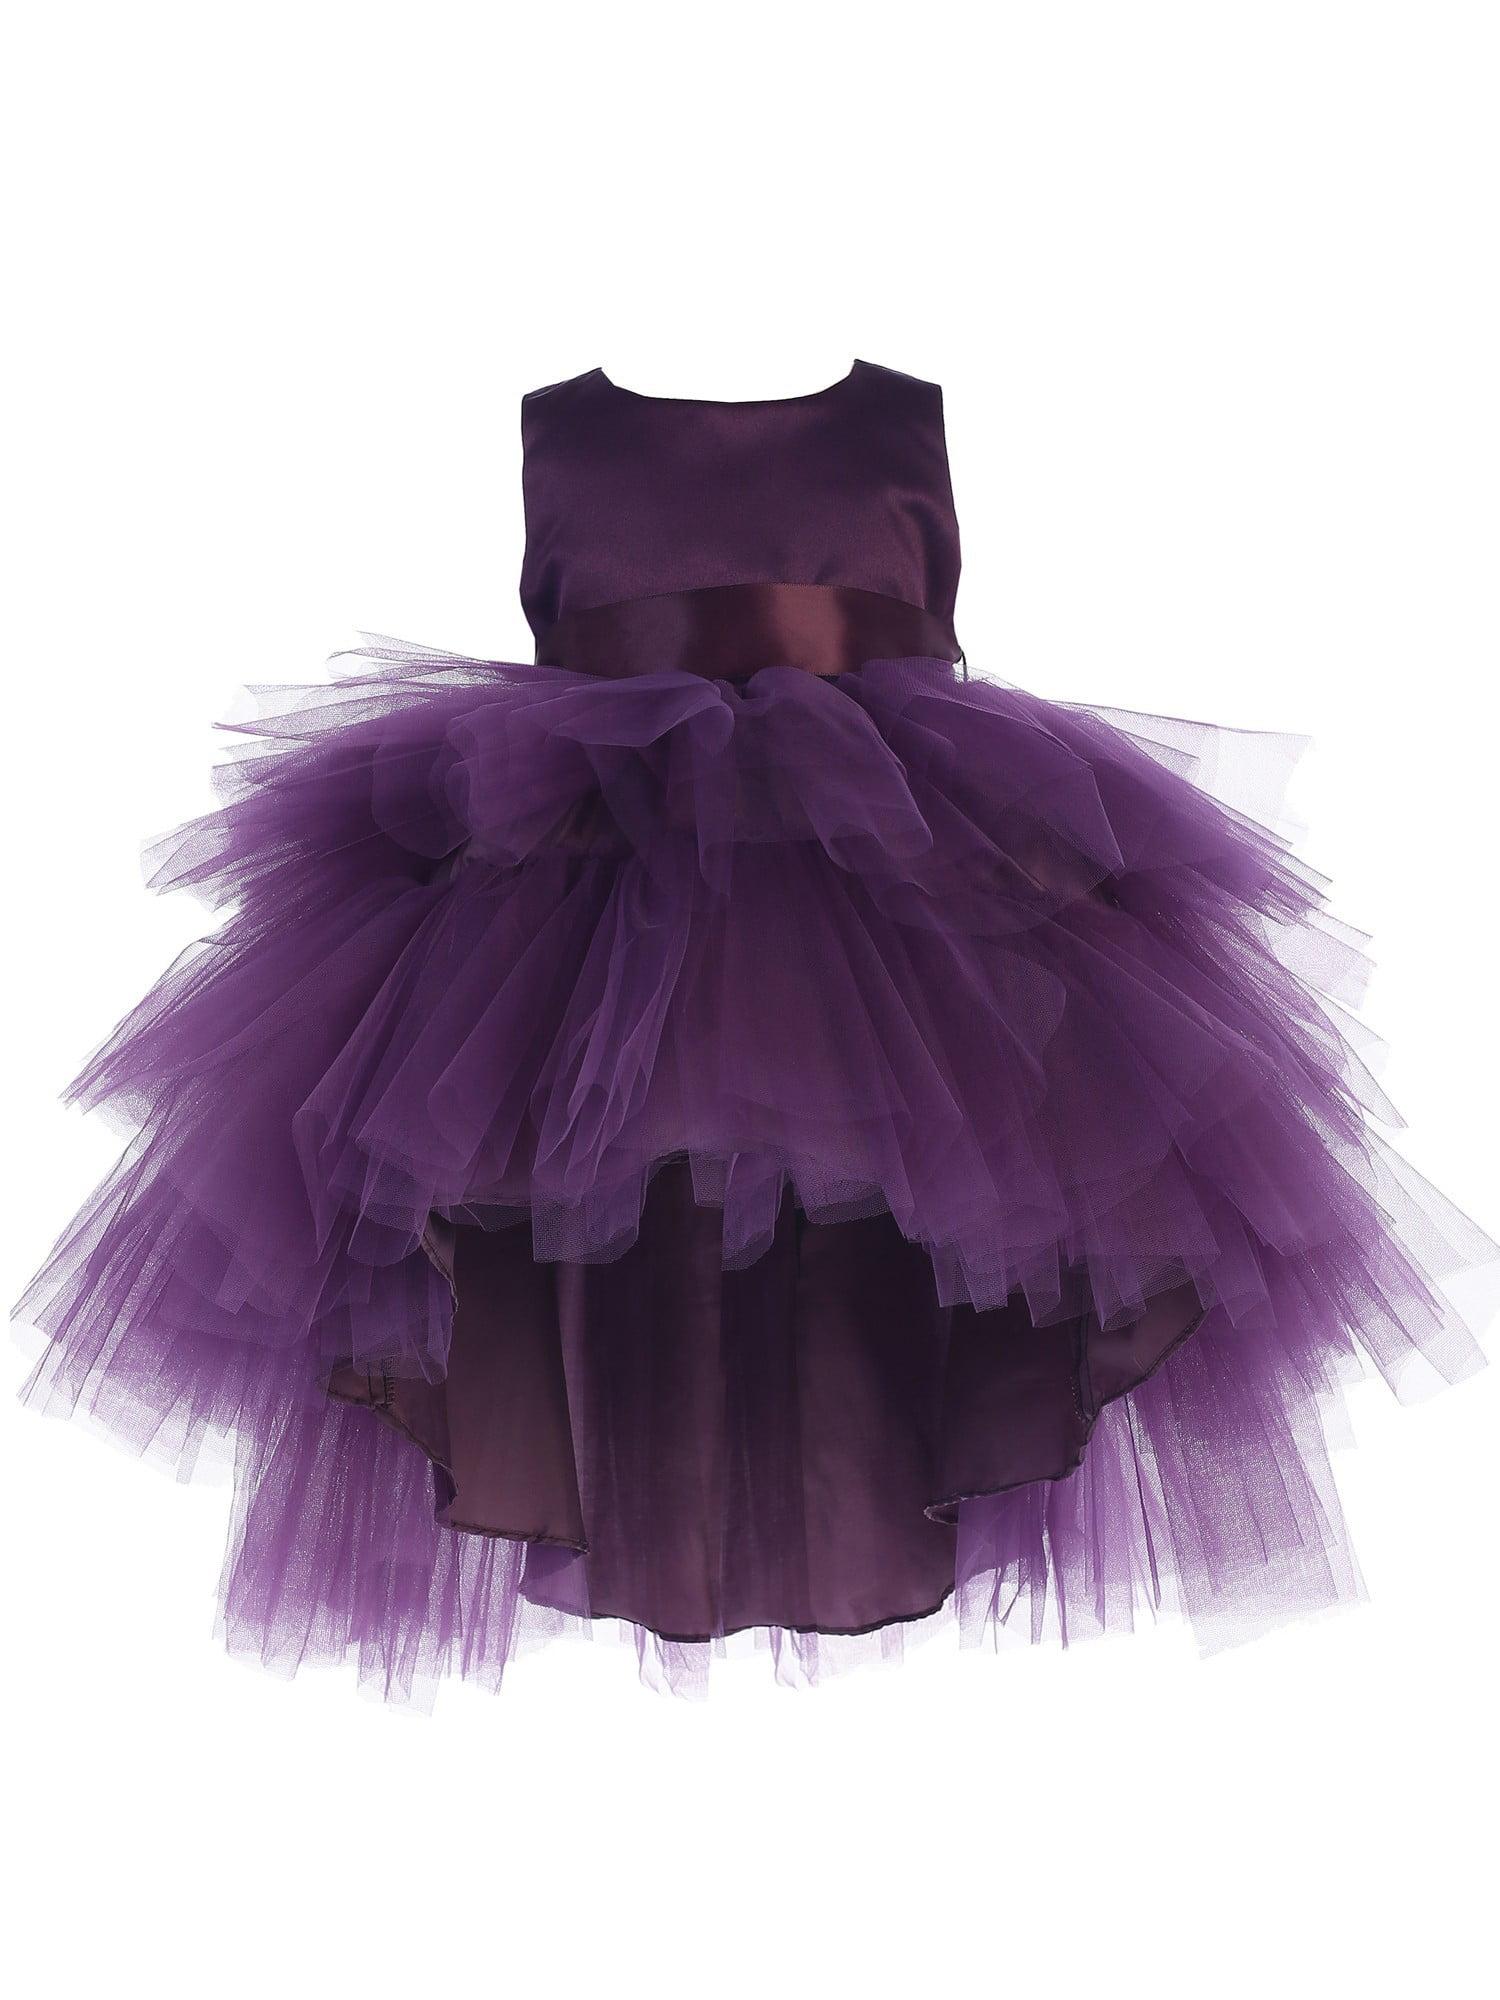 Eggplant Ruffles Tulle High-Low Dress